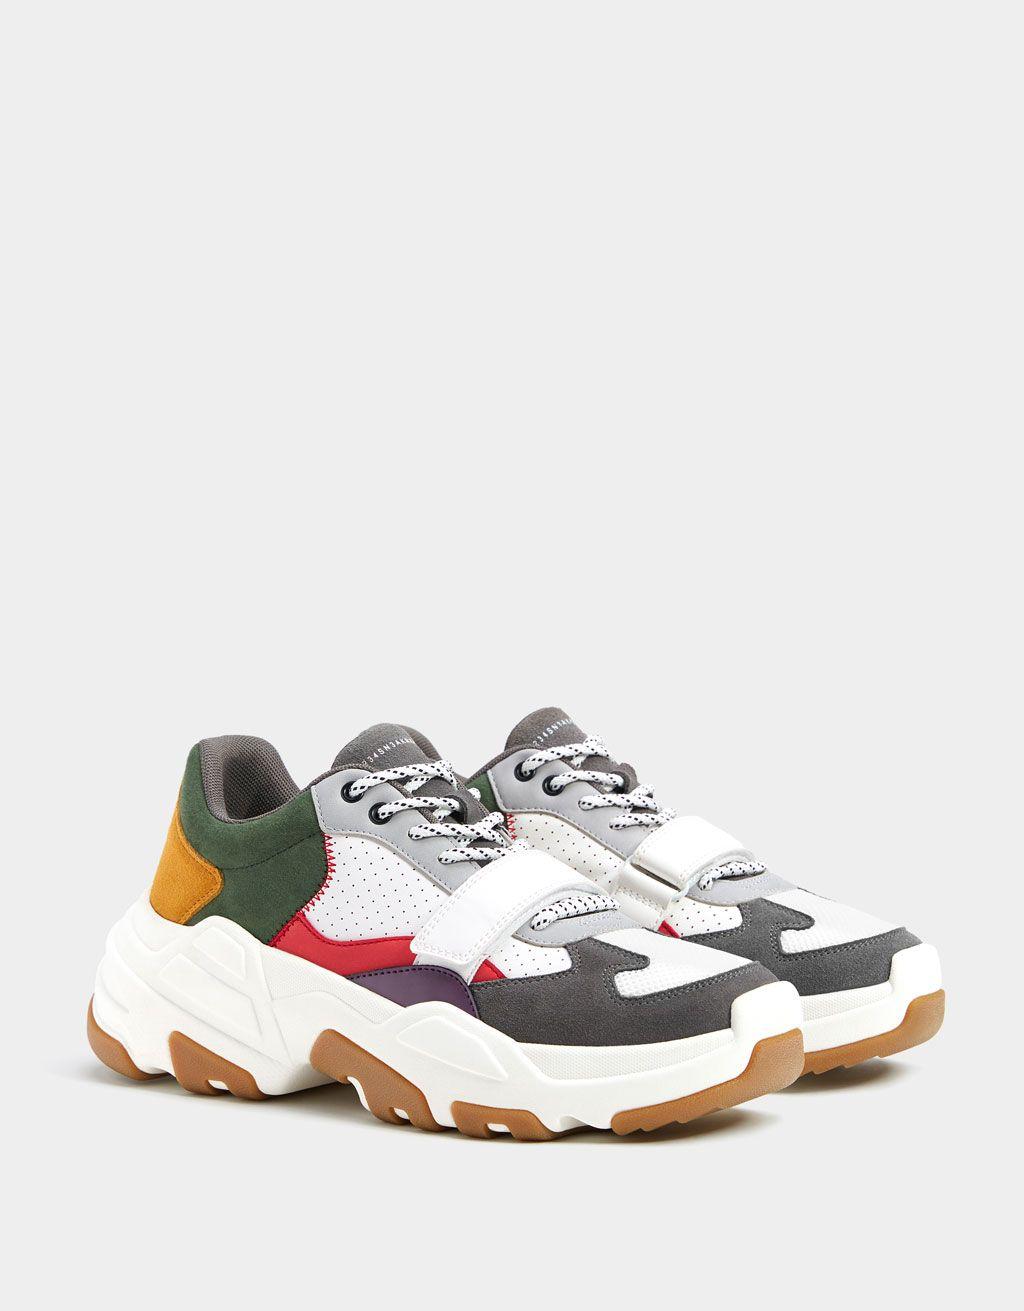 zapatos skechers 2018 new westminster nueva hamburg